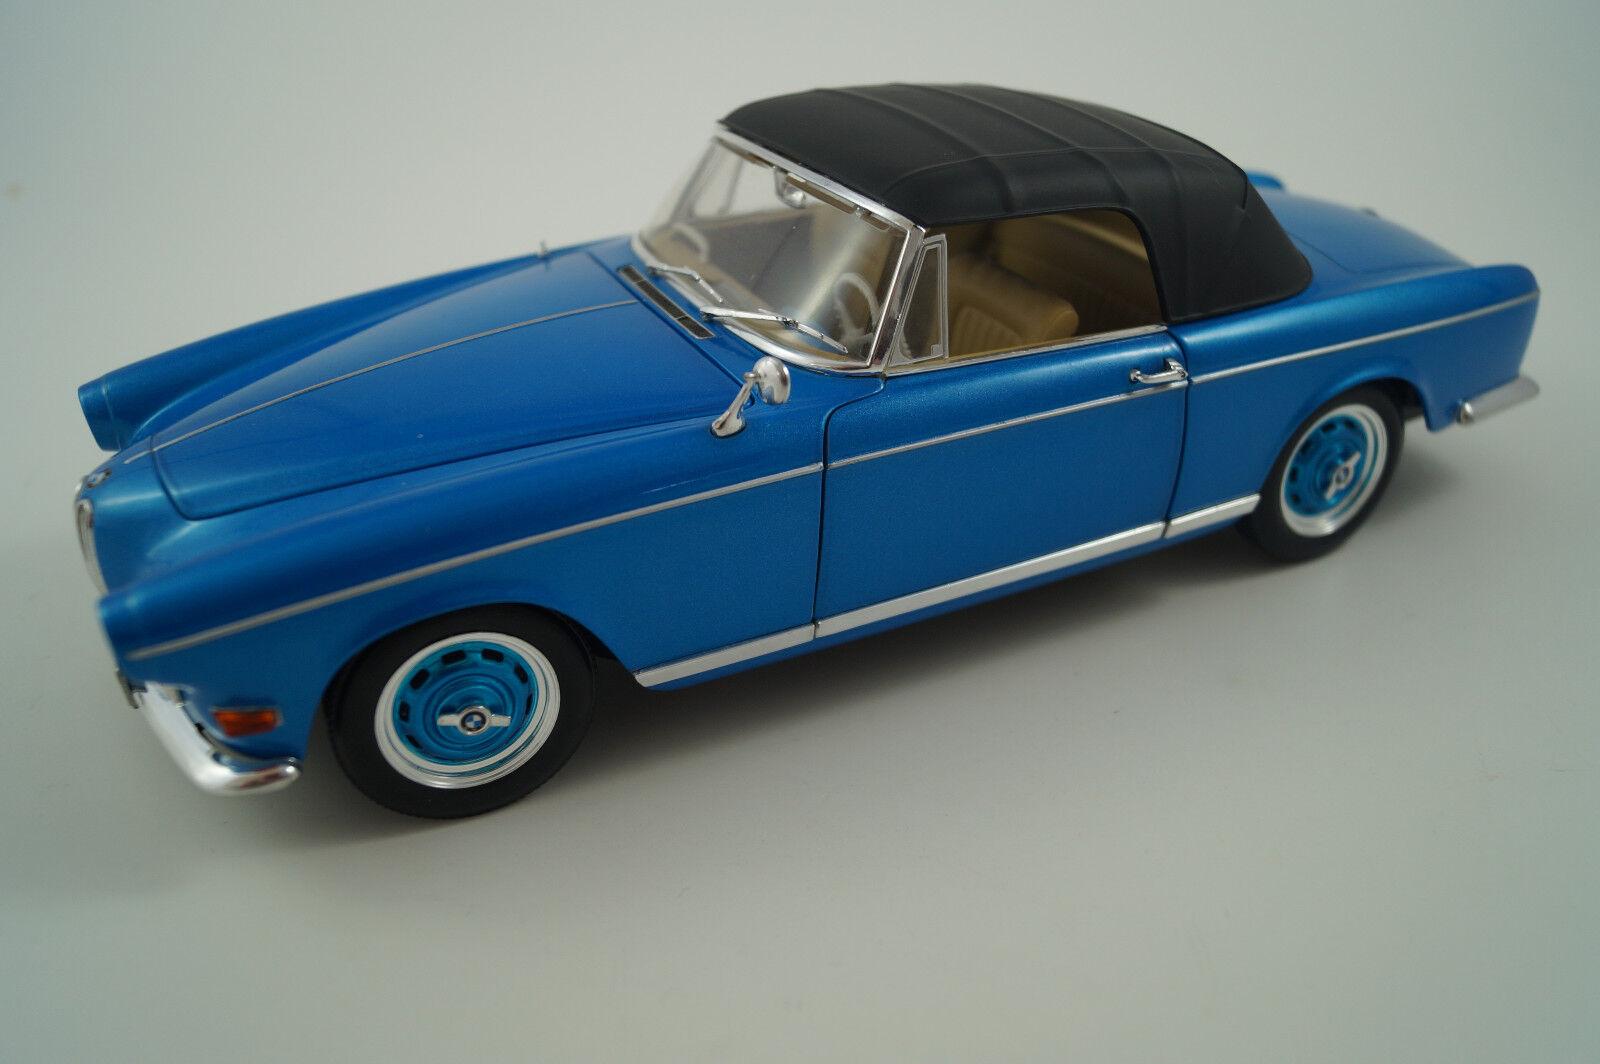 Jadi coche modelo BMW 1 18 503 1956